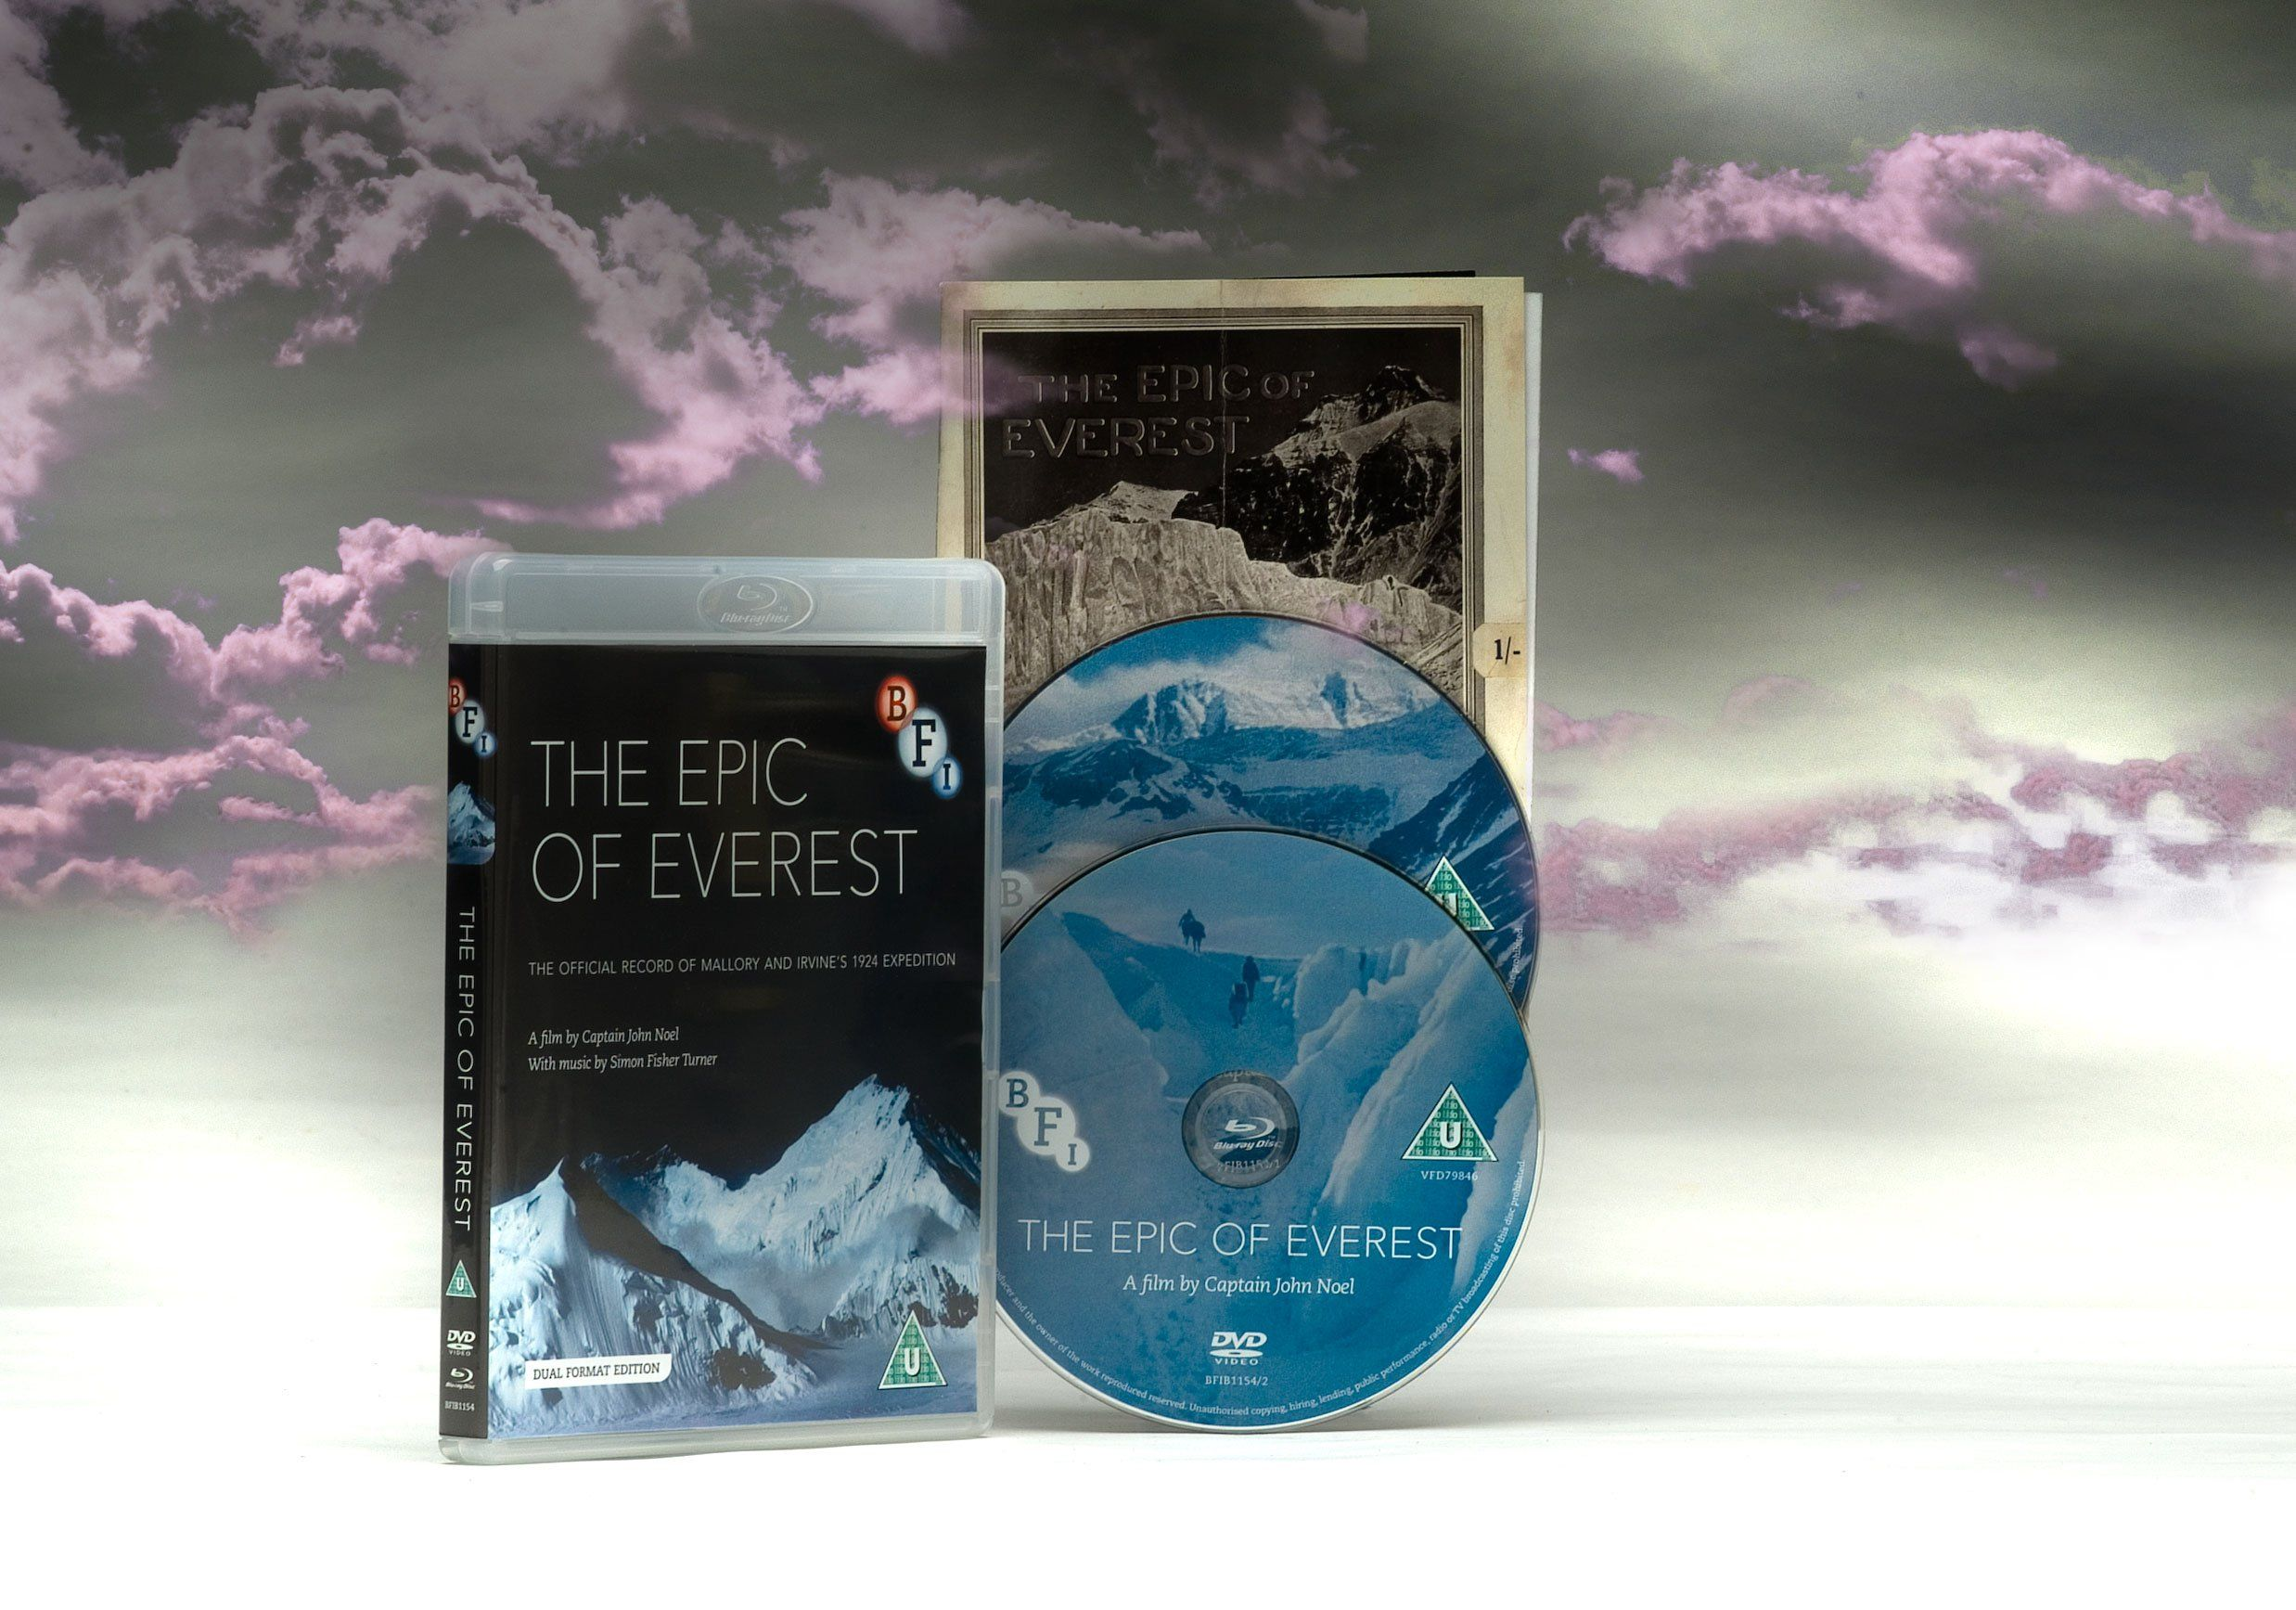 The Epic of Everest (DVD Bluray) [Reino Unido] DVD,